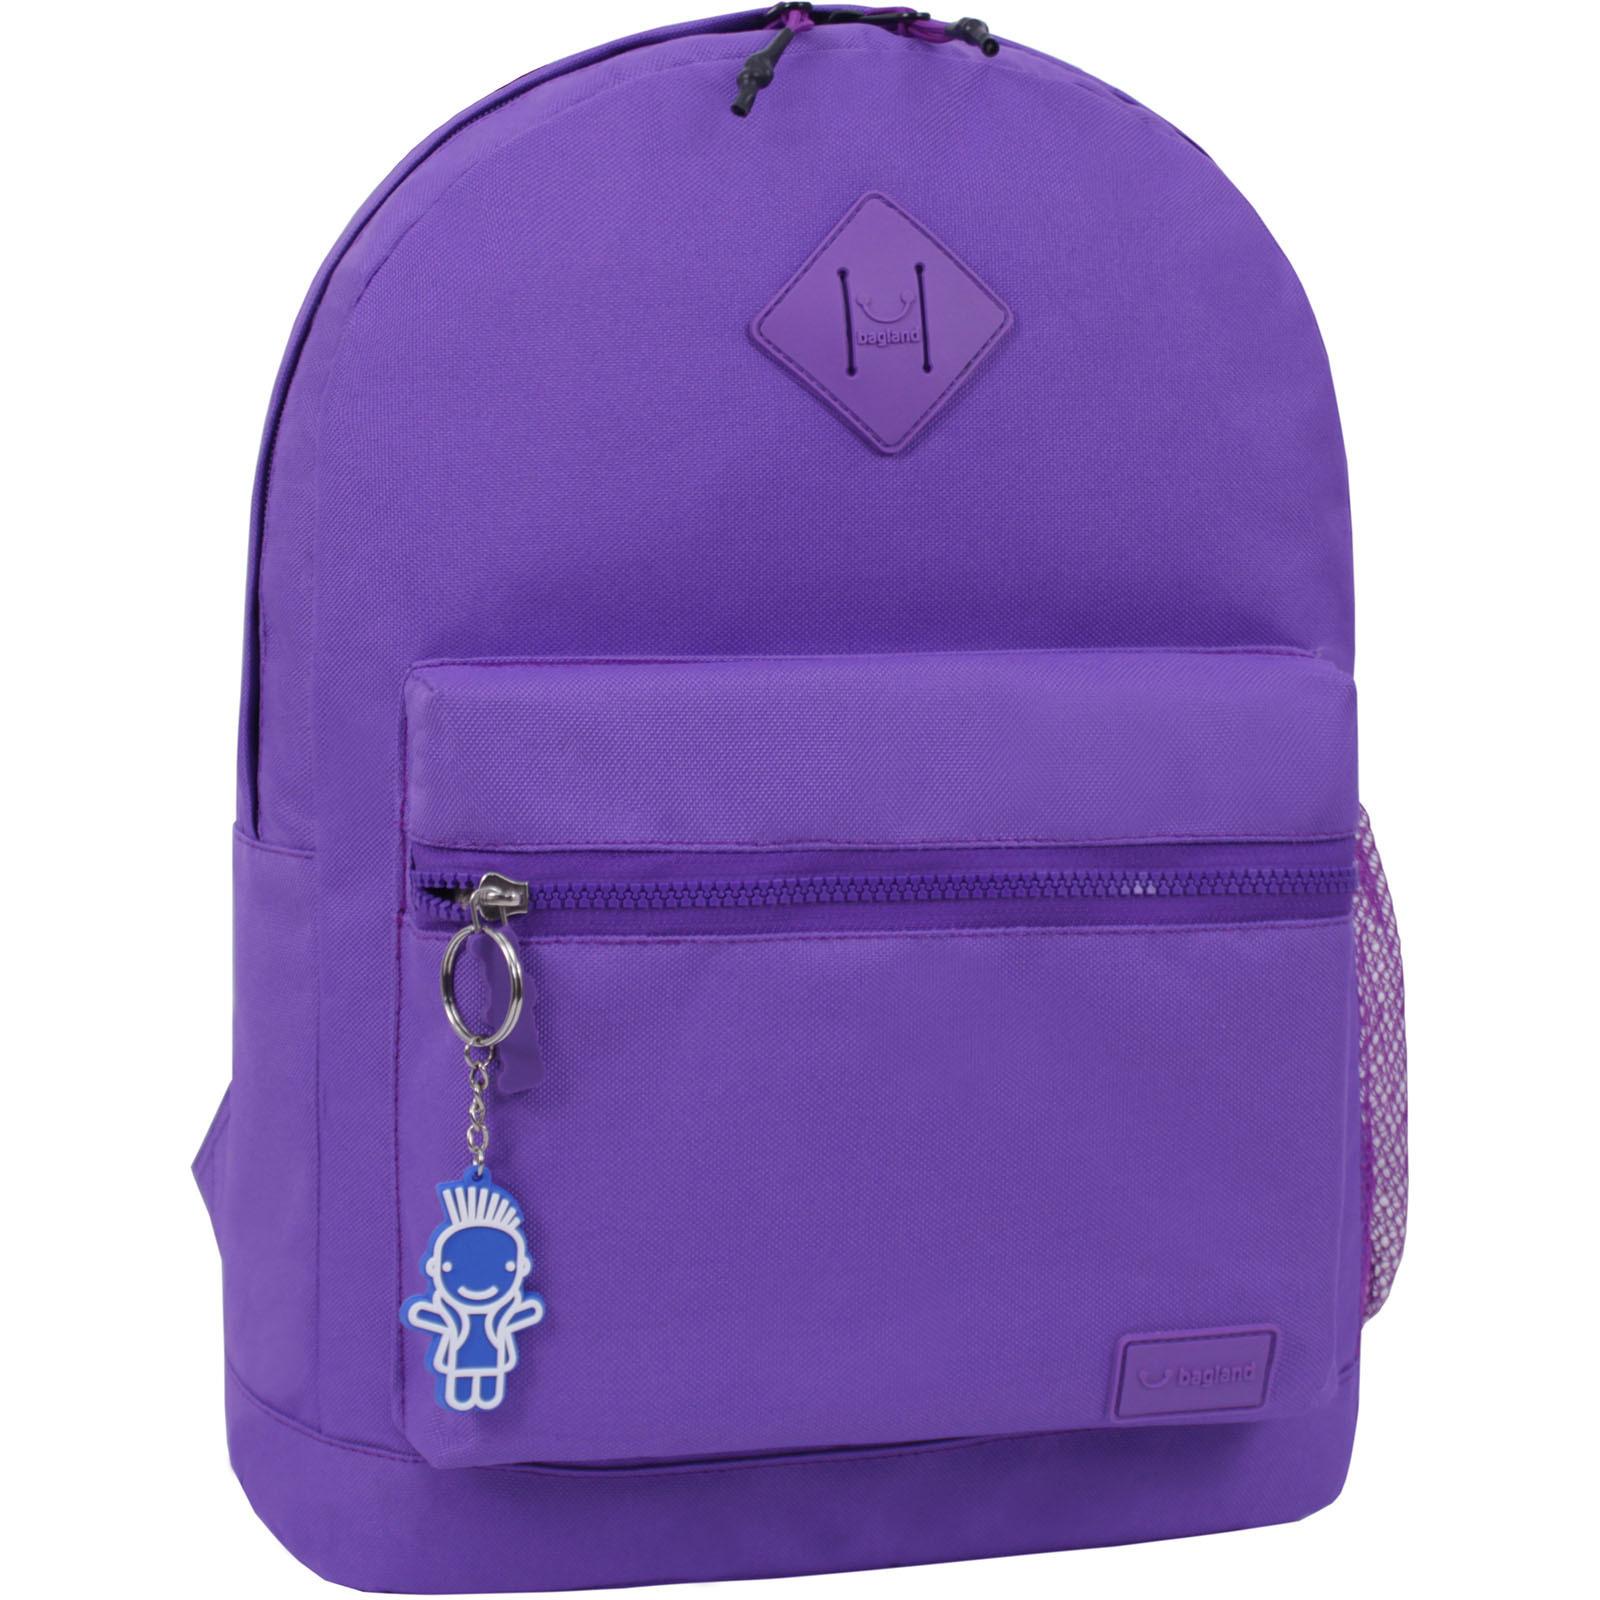 Молодежные рюкзаки Рюкзак Bagland Hood W/R 17 л. фиолетовый 469 (0054466) IMG_6405_суб._469_.JPG